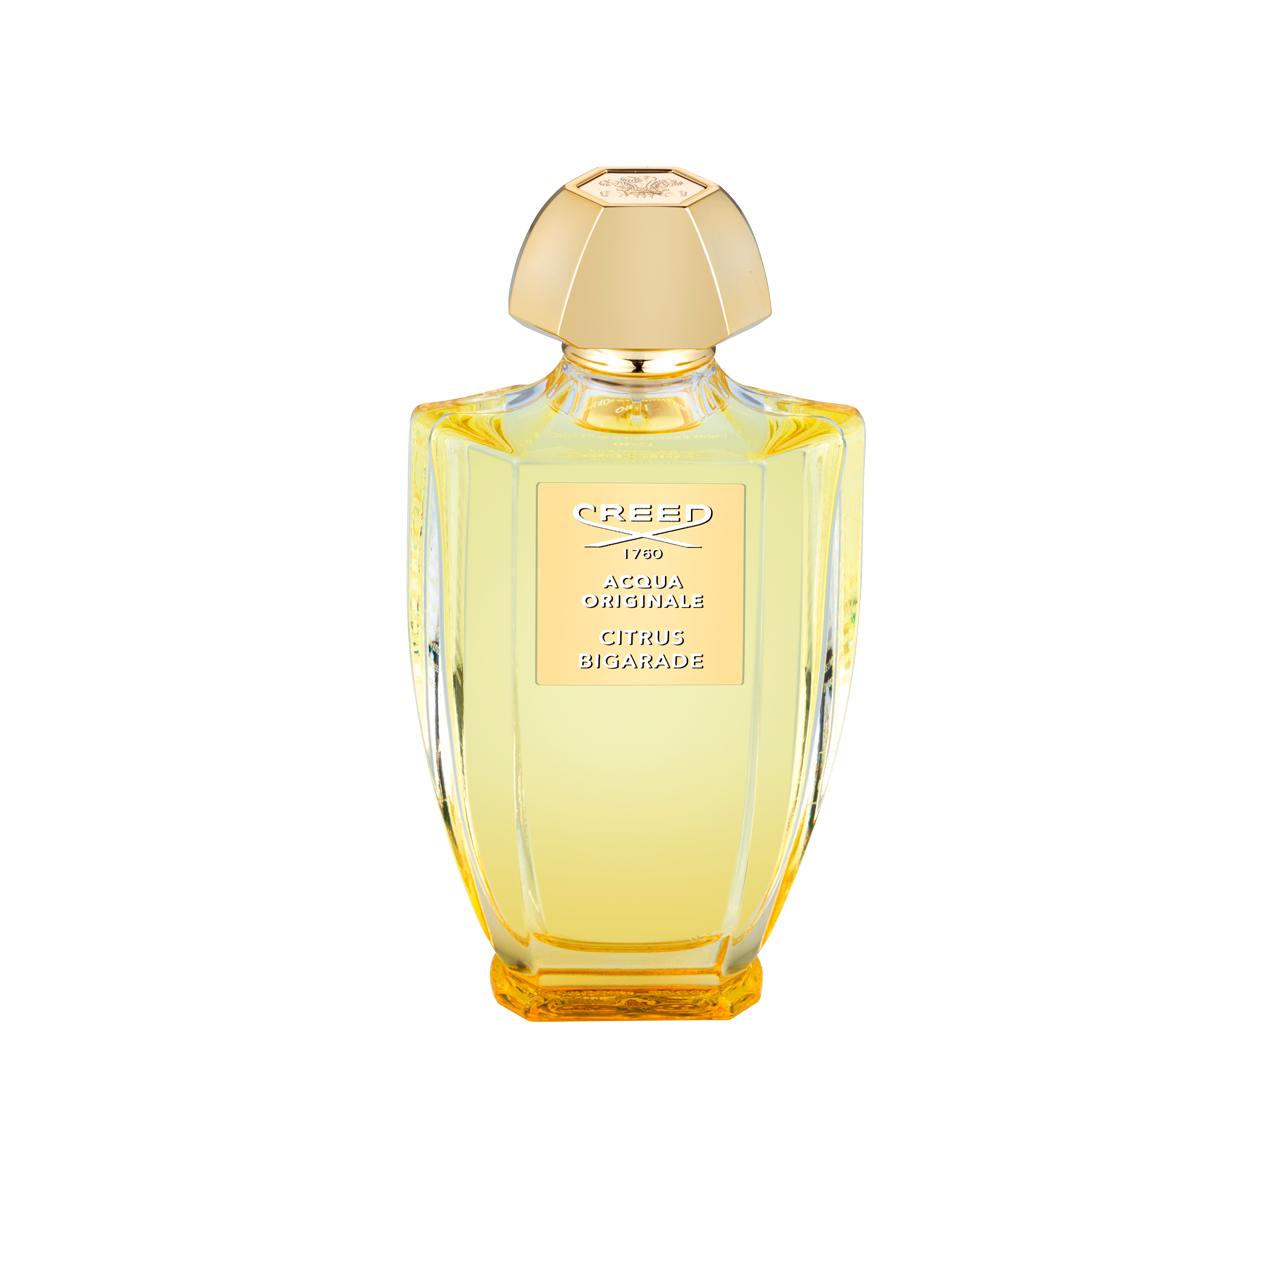 Citrus Bigarade Acqua Originale - Eau de Parfum